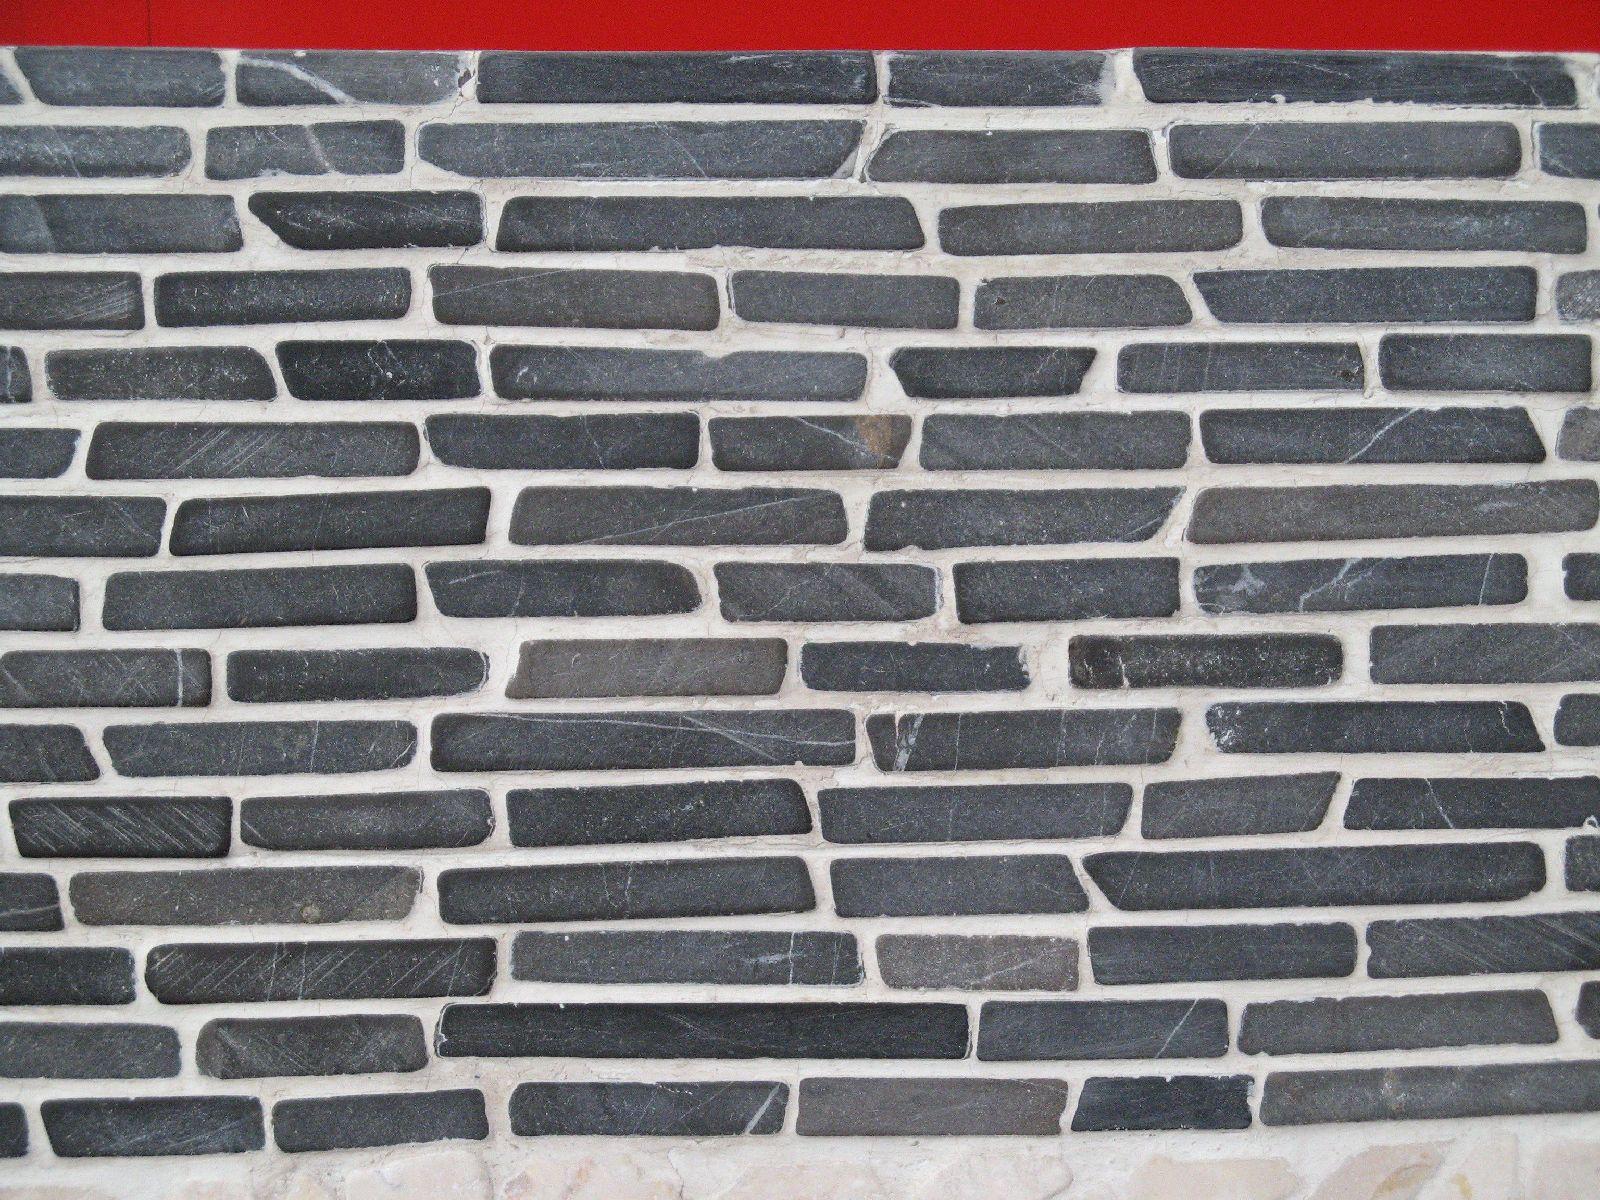 Brick_Texture_B_4686